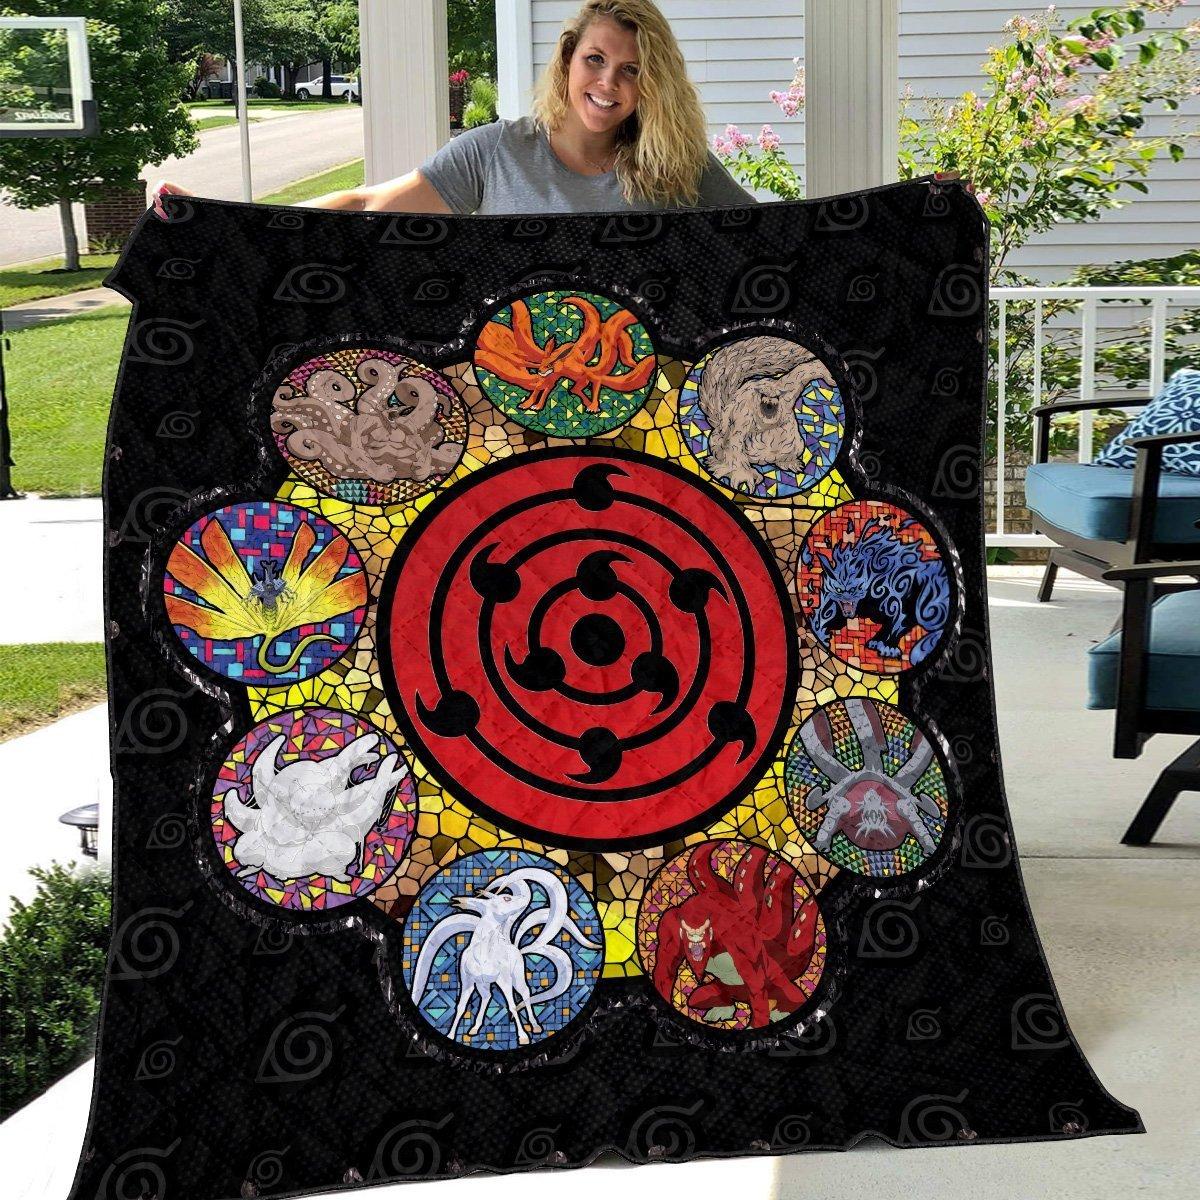 tailed beast quilt blanket 239262 - Otaku Treat